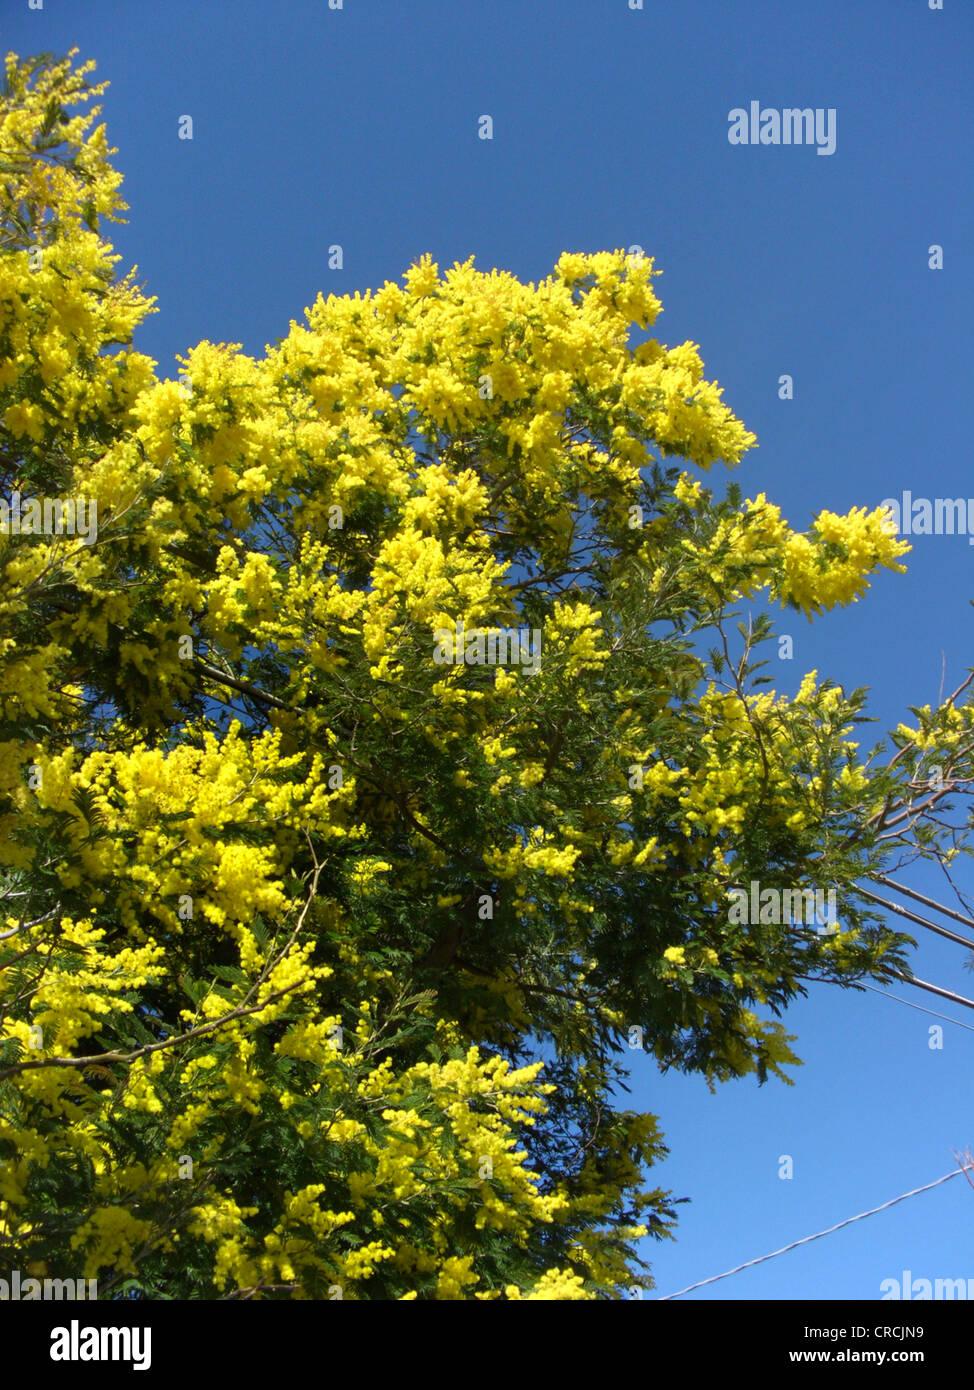 silver wattle (Acacia dealbata), blooming single tree - Stock Image